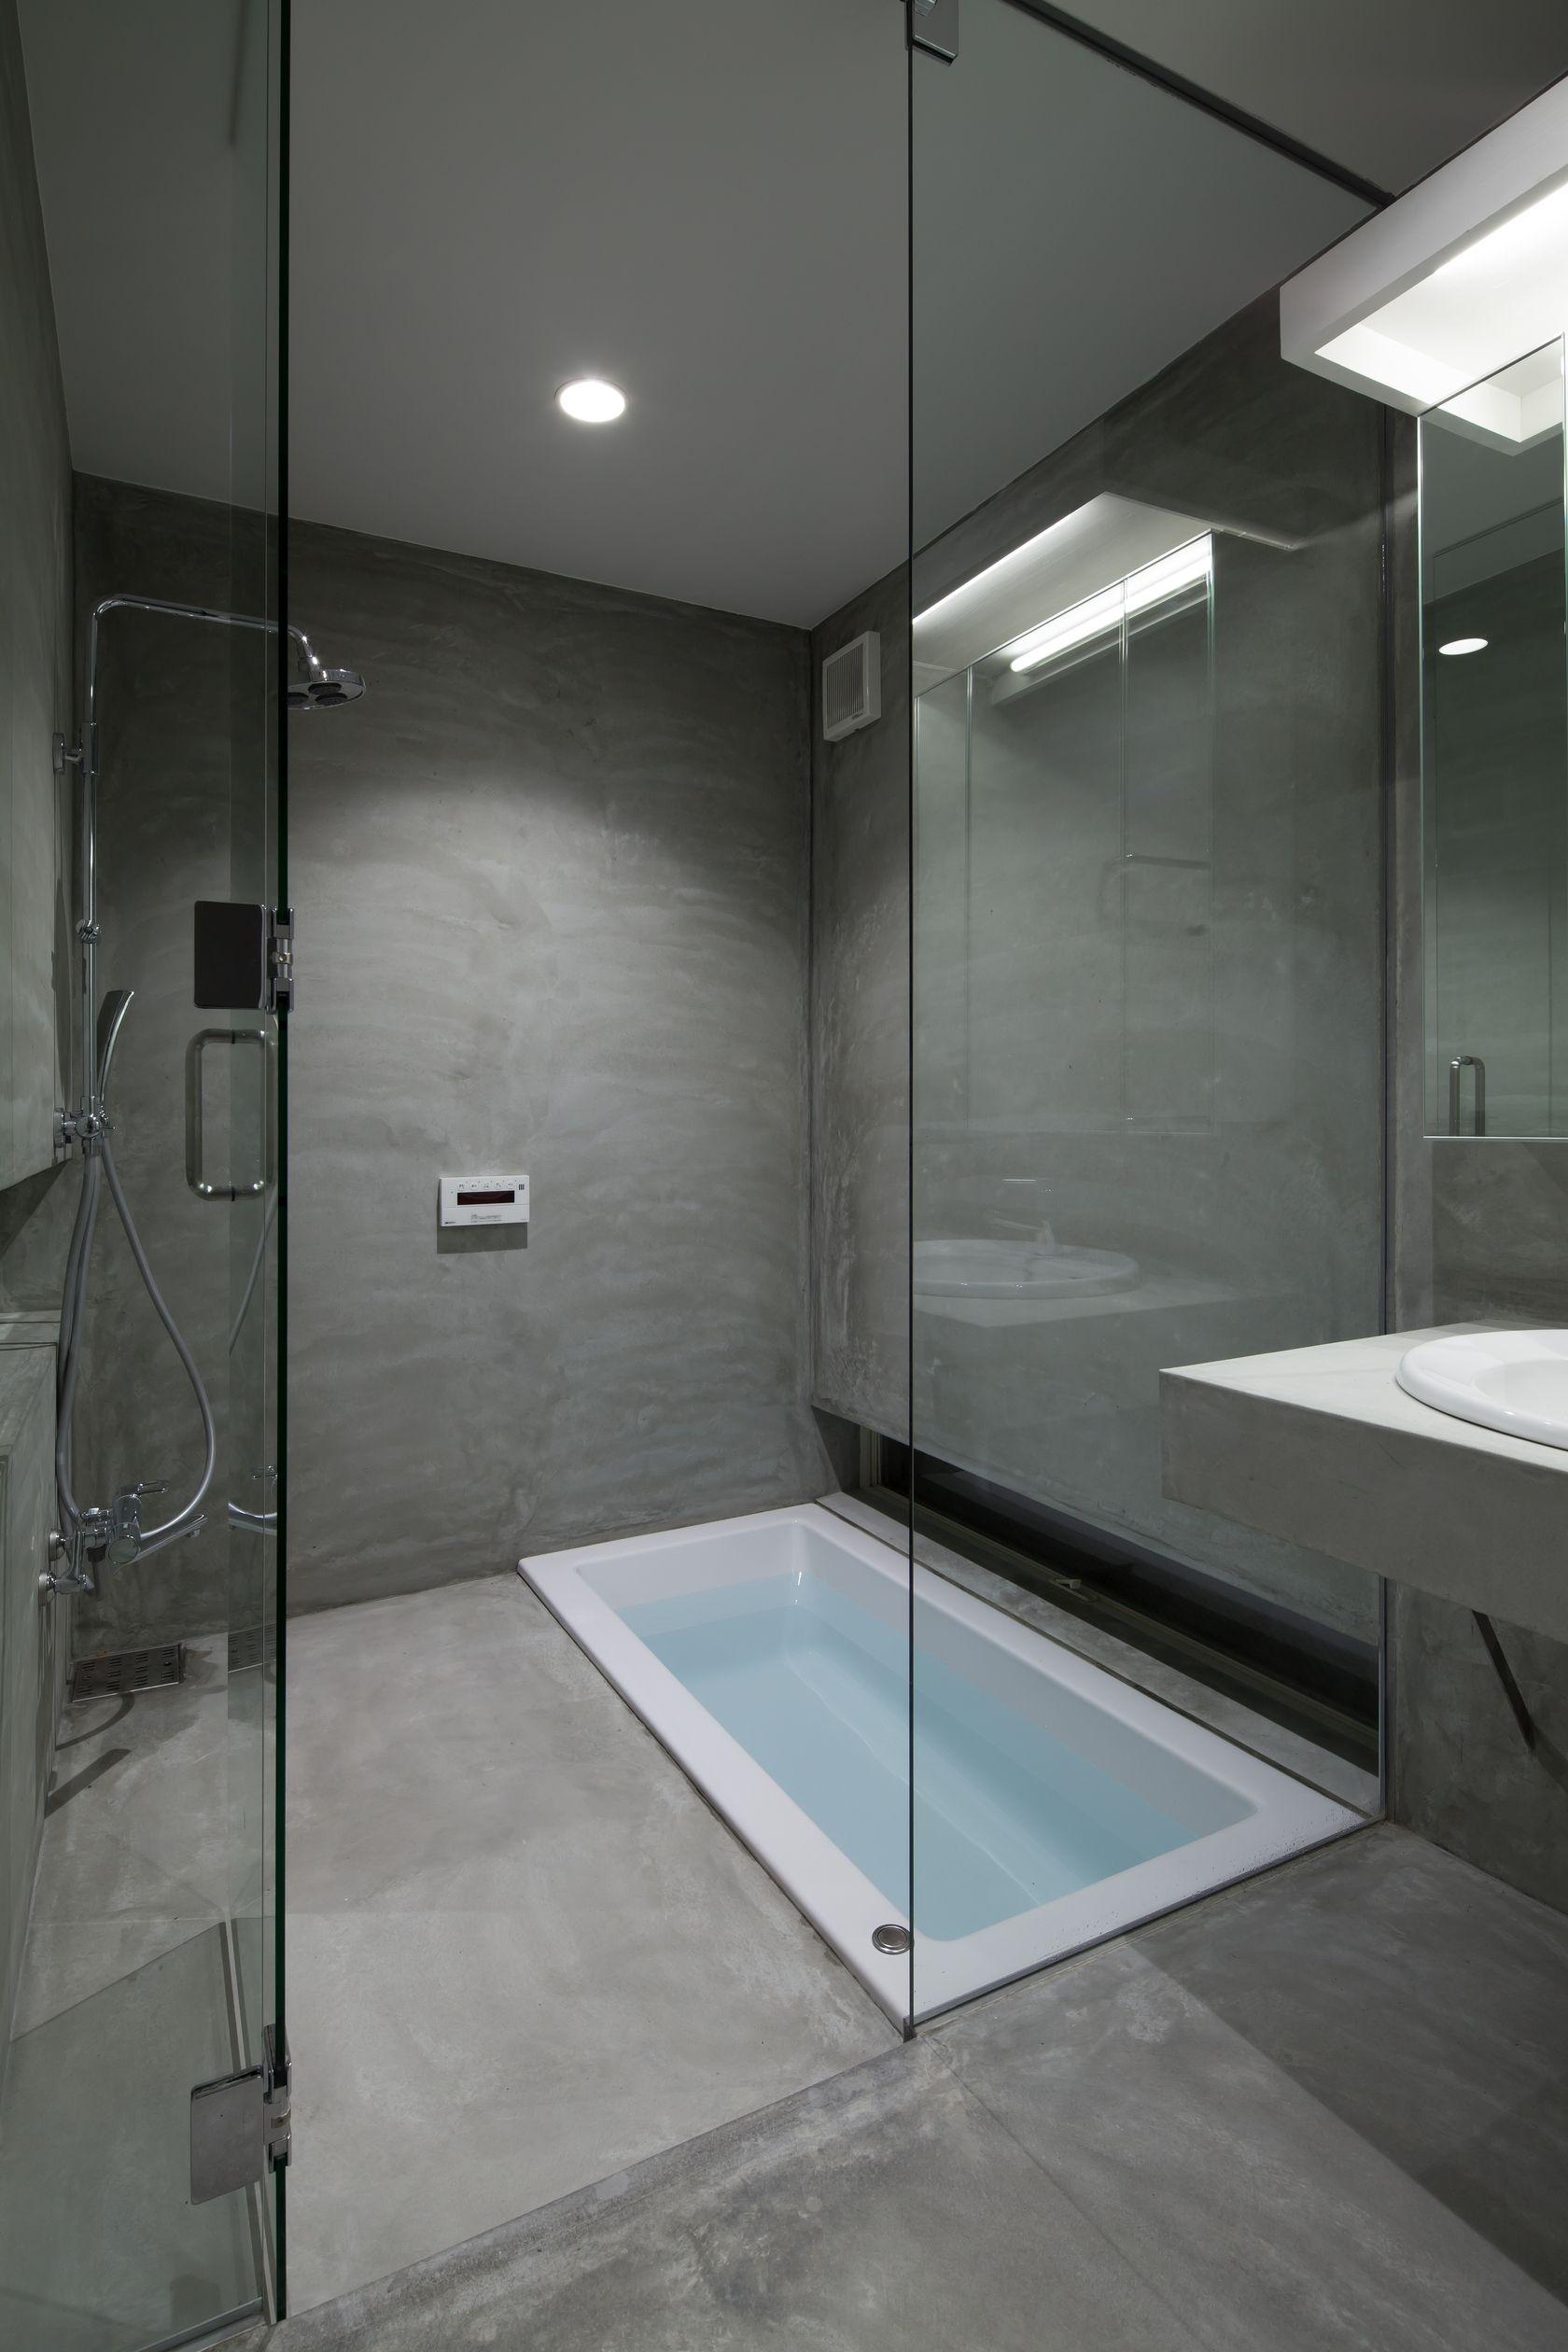 Mampara de ducha mampara de ducha barcelona mamparas for Mamparas ducha barcelona